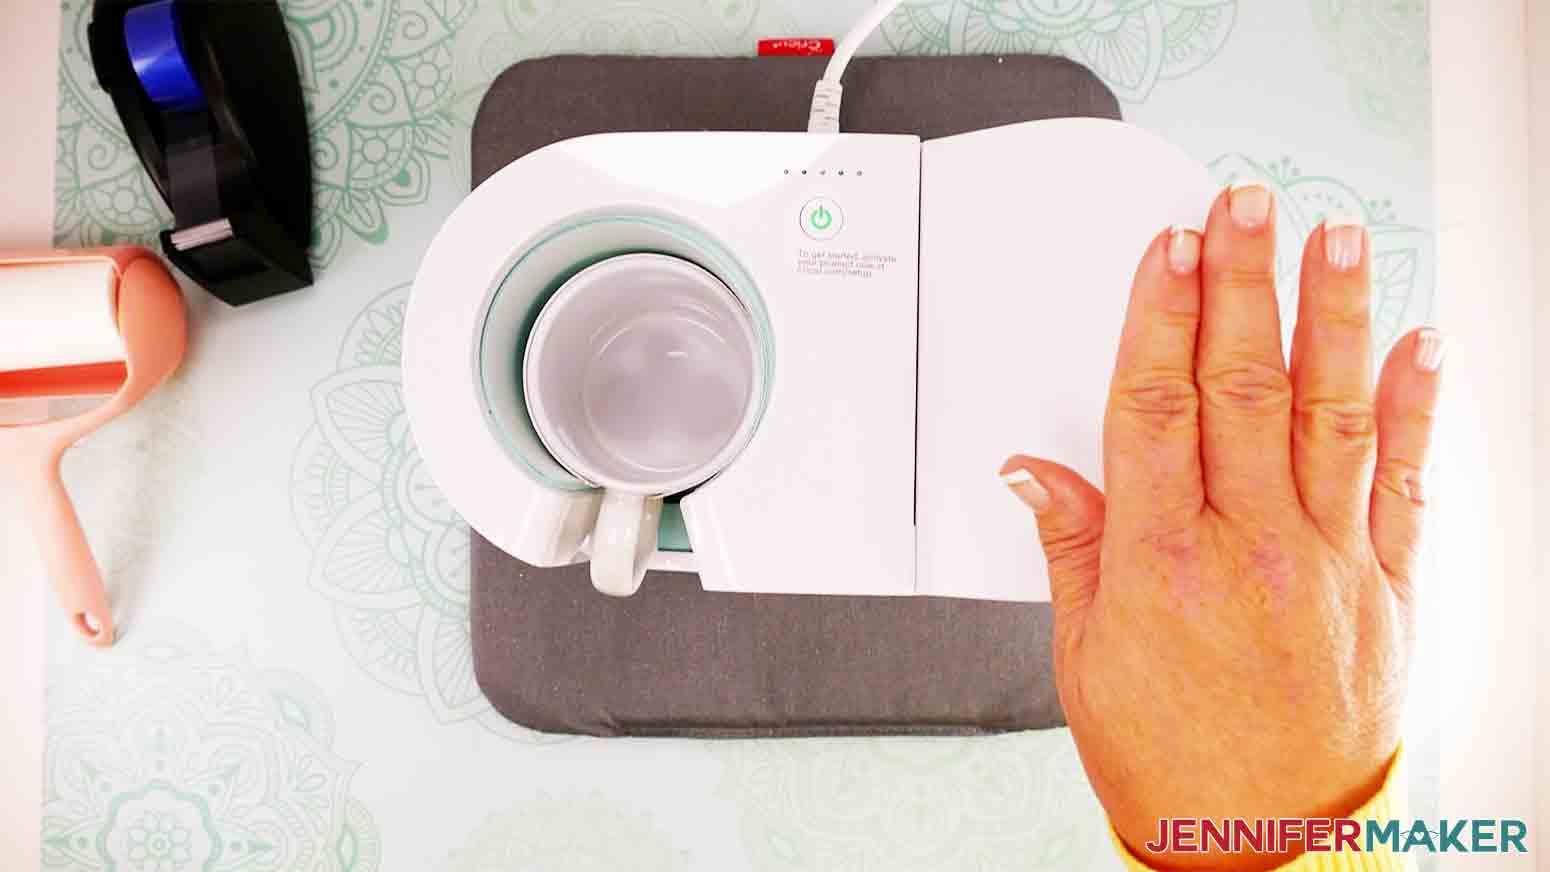 pressing down lever to start Cricut Mug press